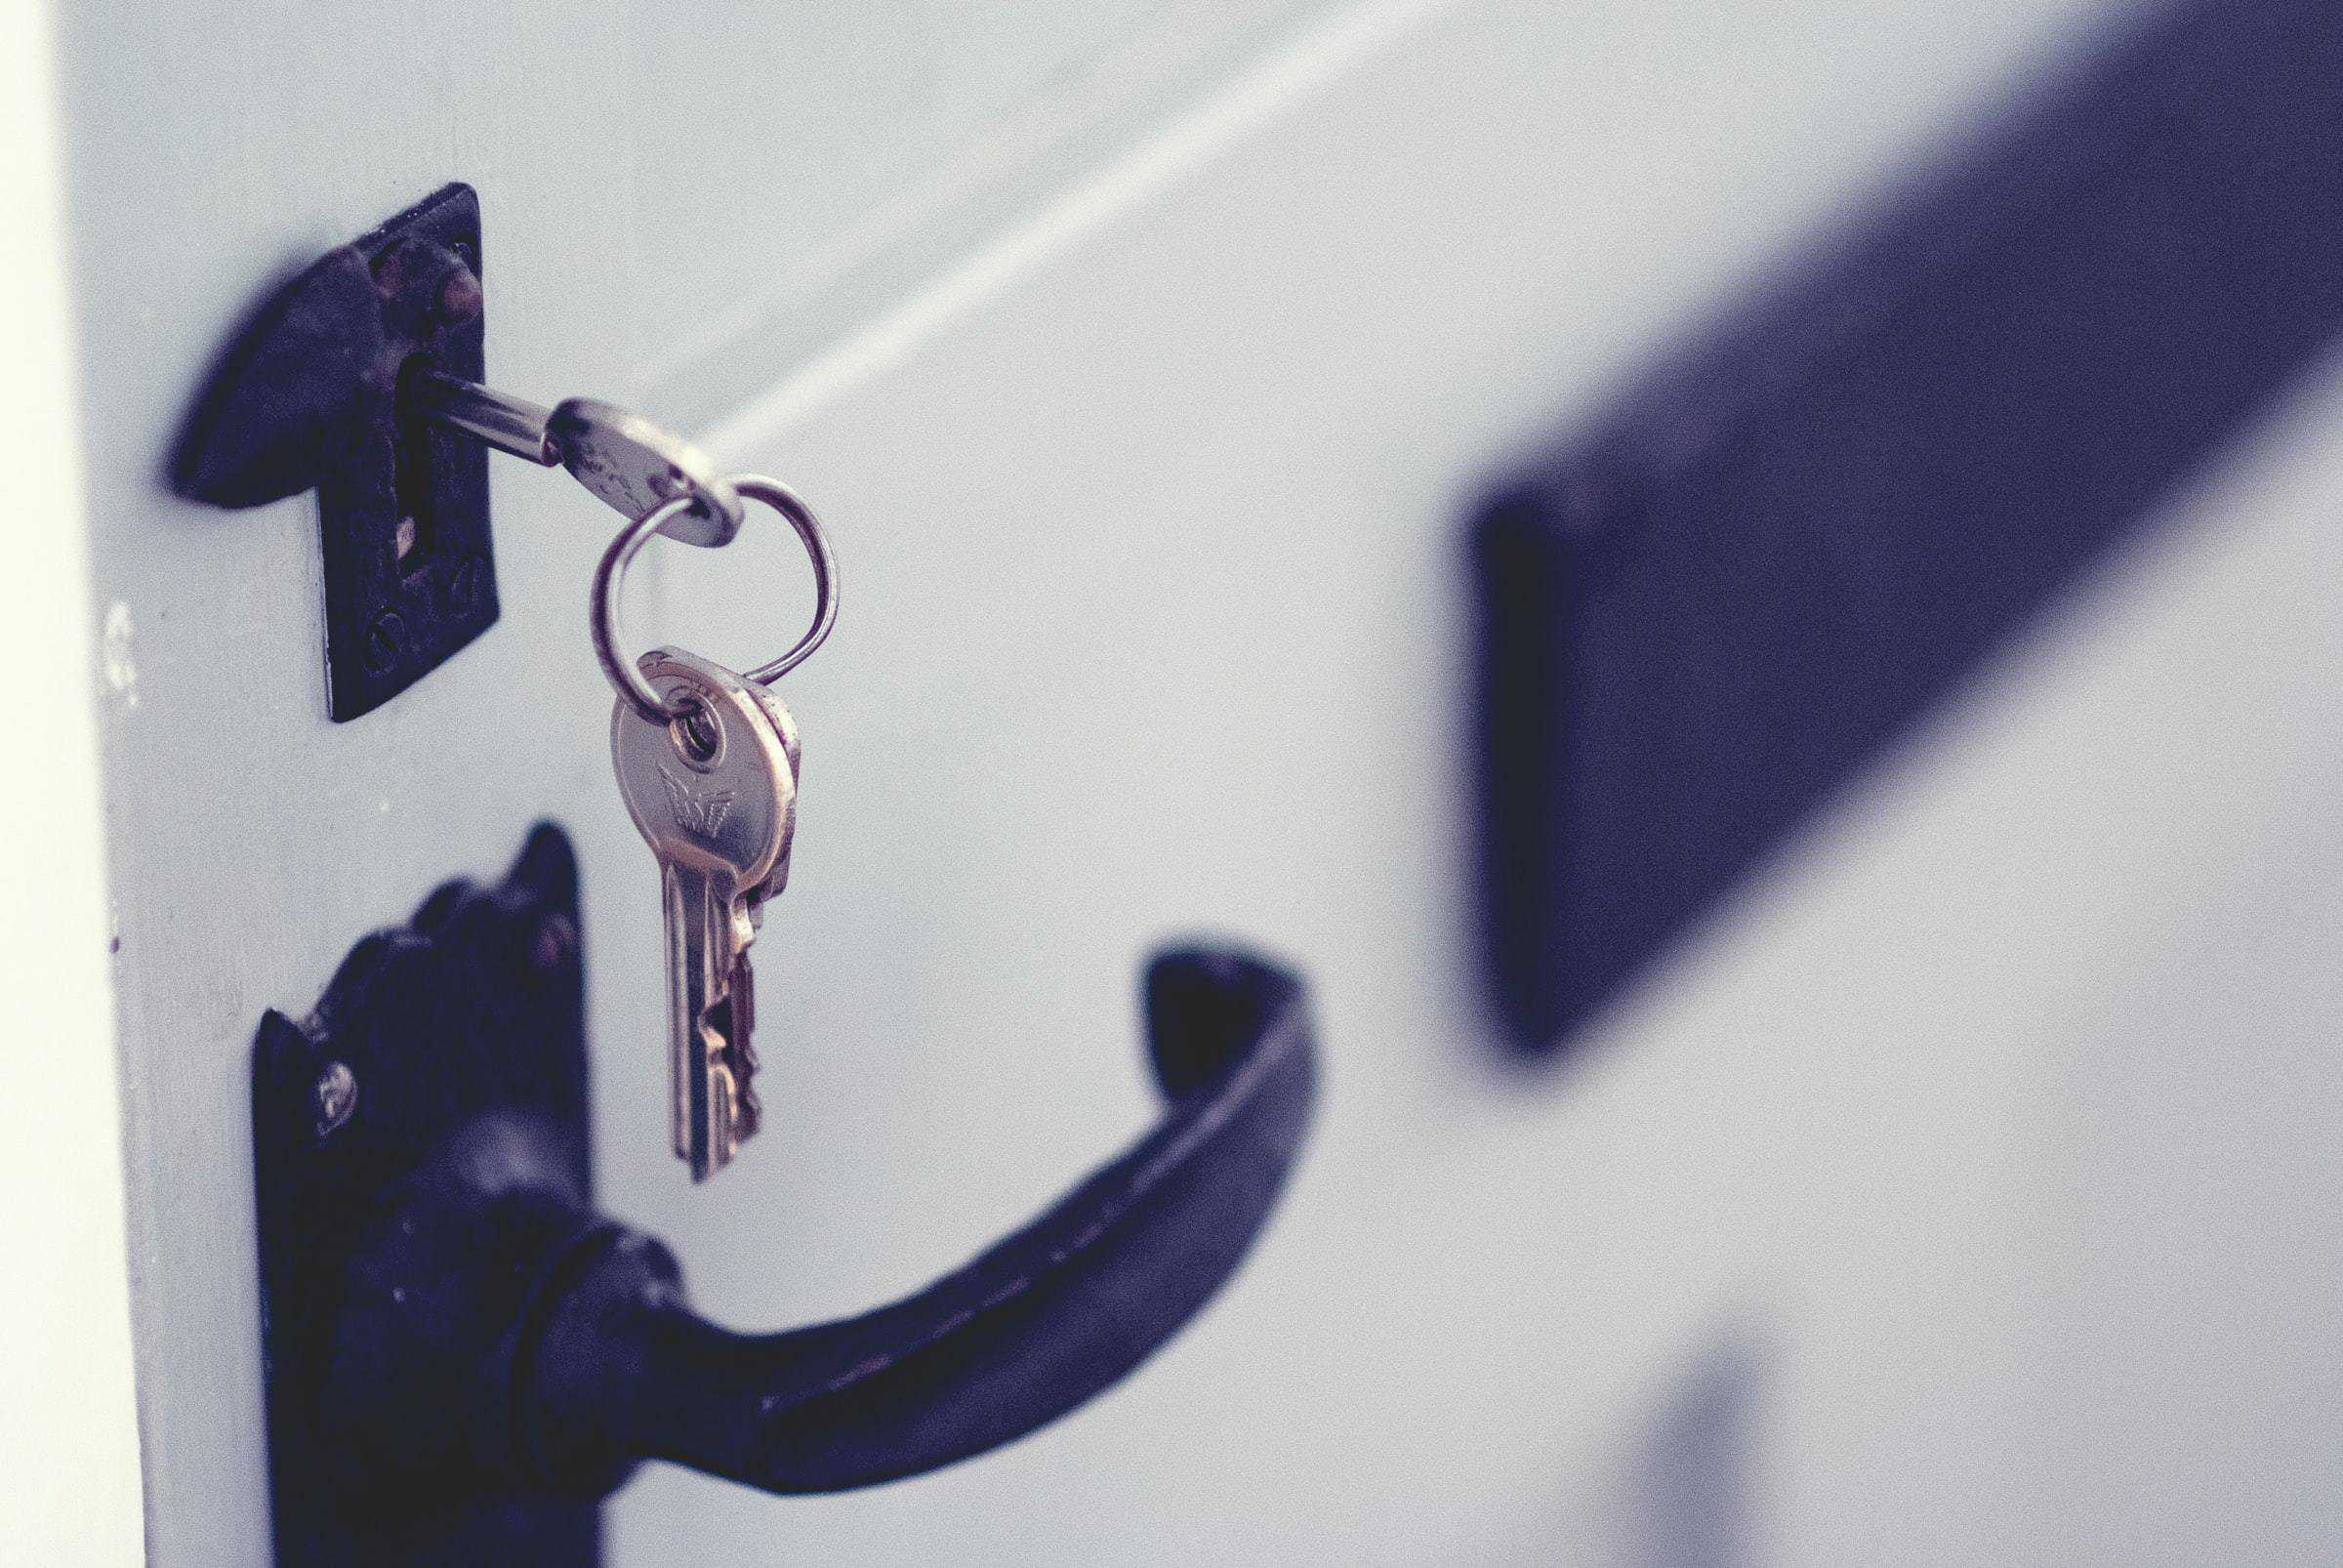 Unlocking June and July 2020 Premium Articles